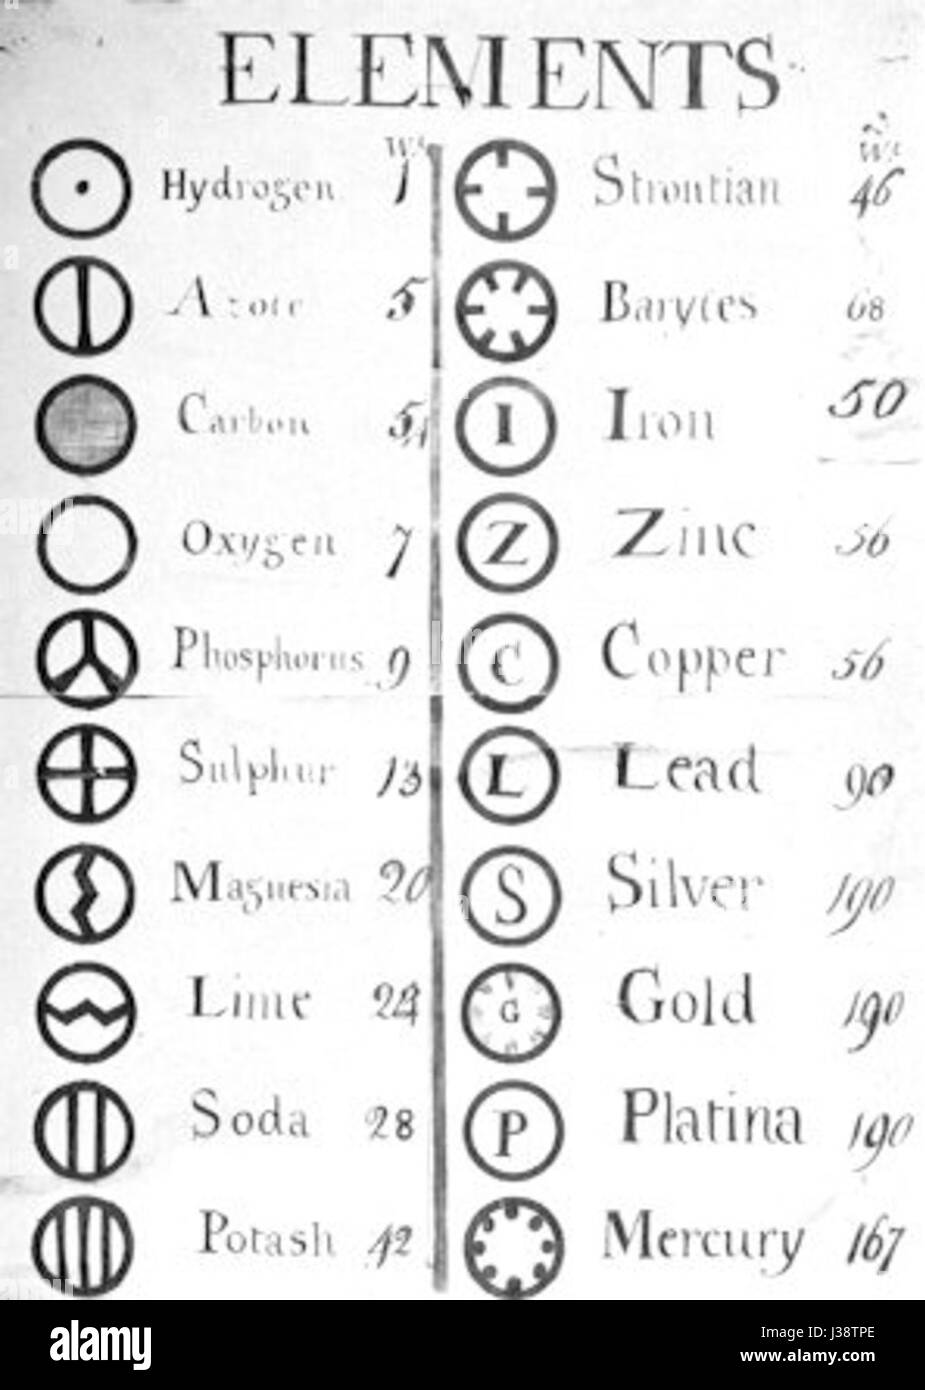 Dalton atomic symbols stock photo 139721974 alamy dalton atomic symbols buycottarizona Image collections